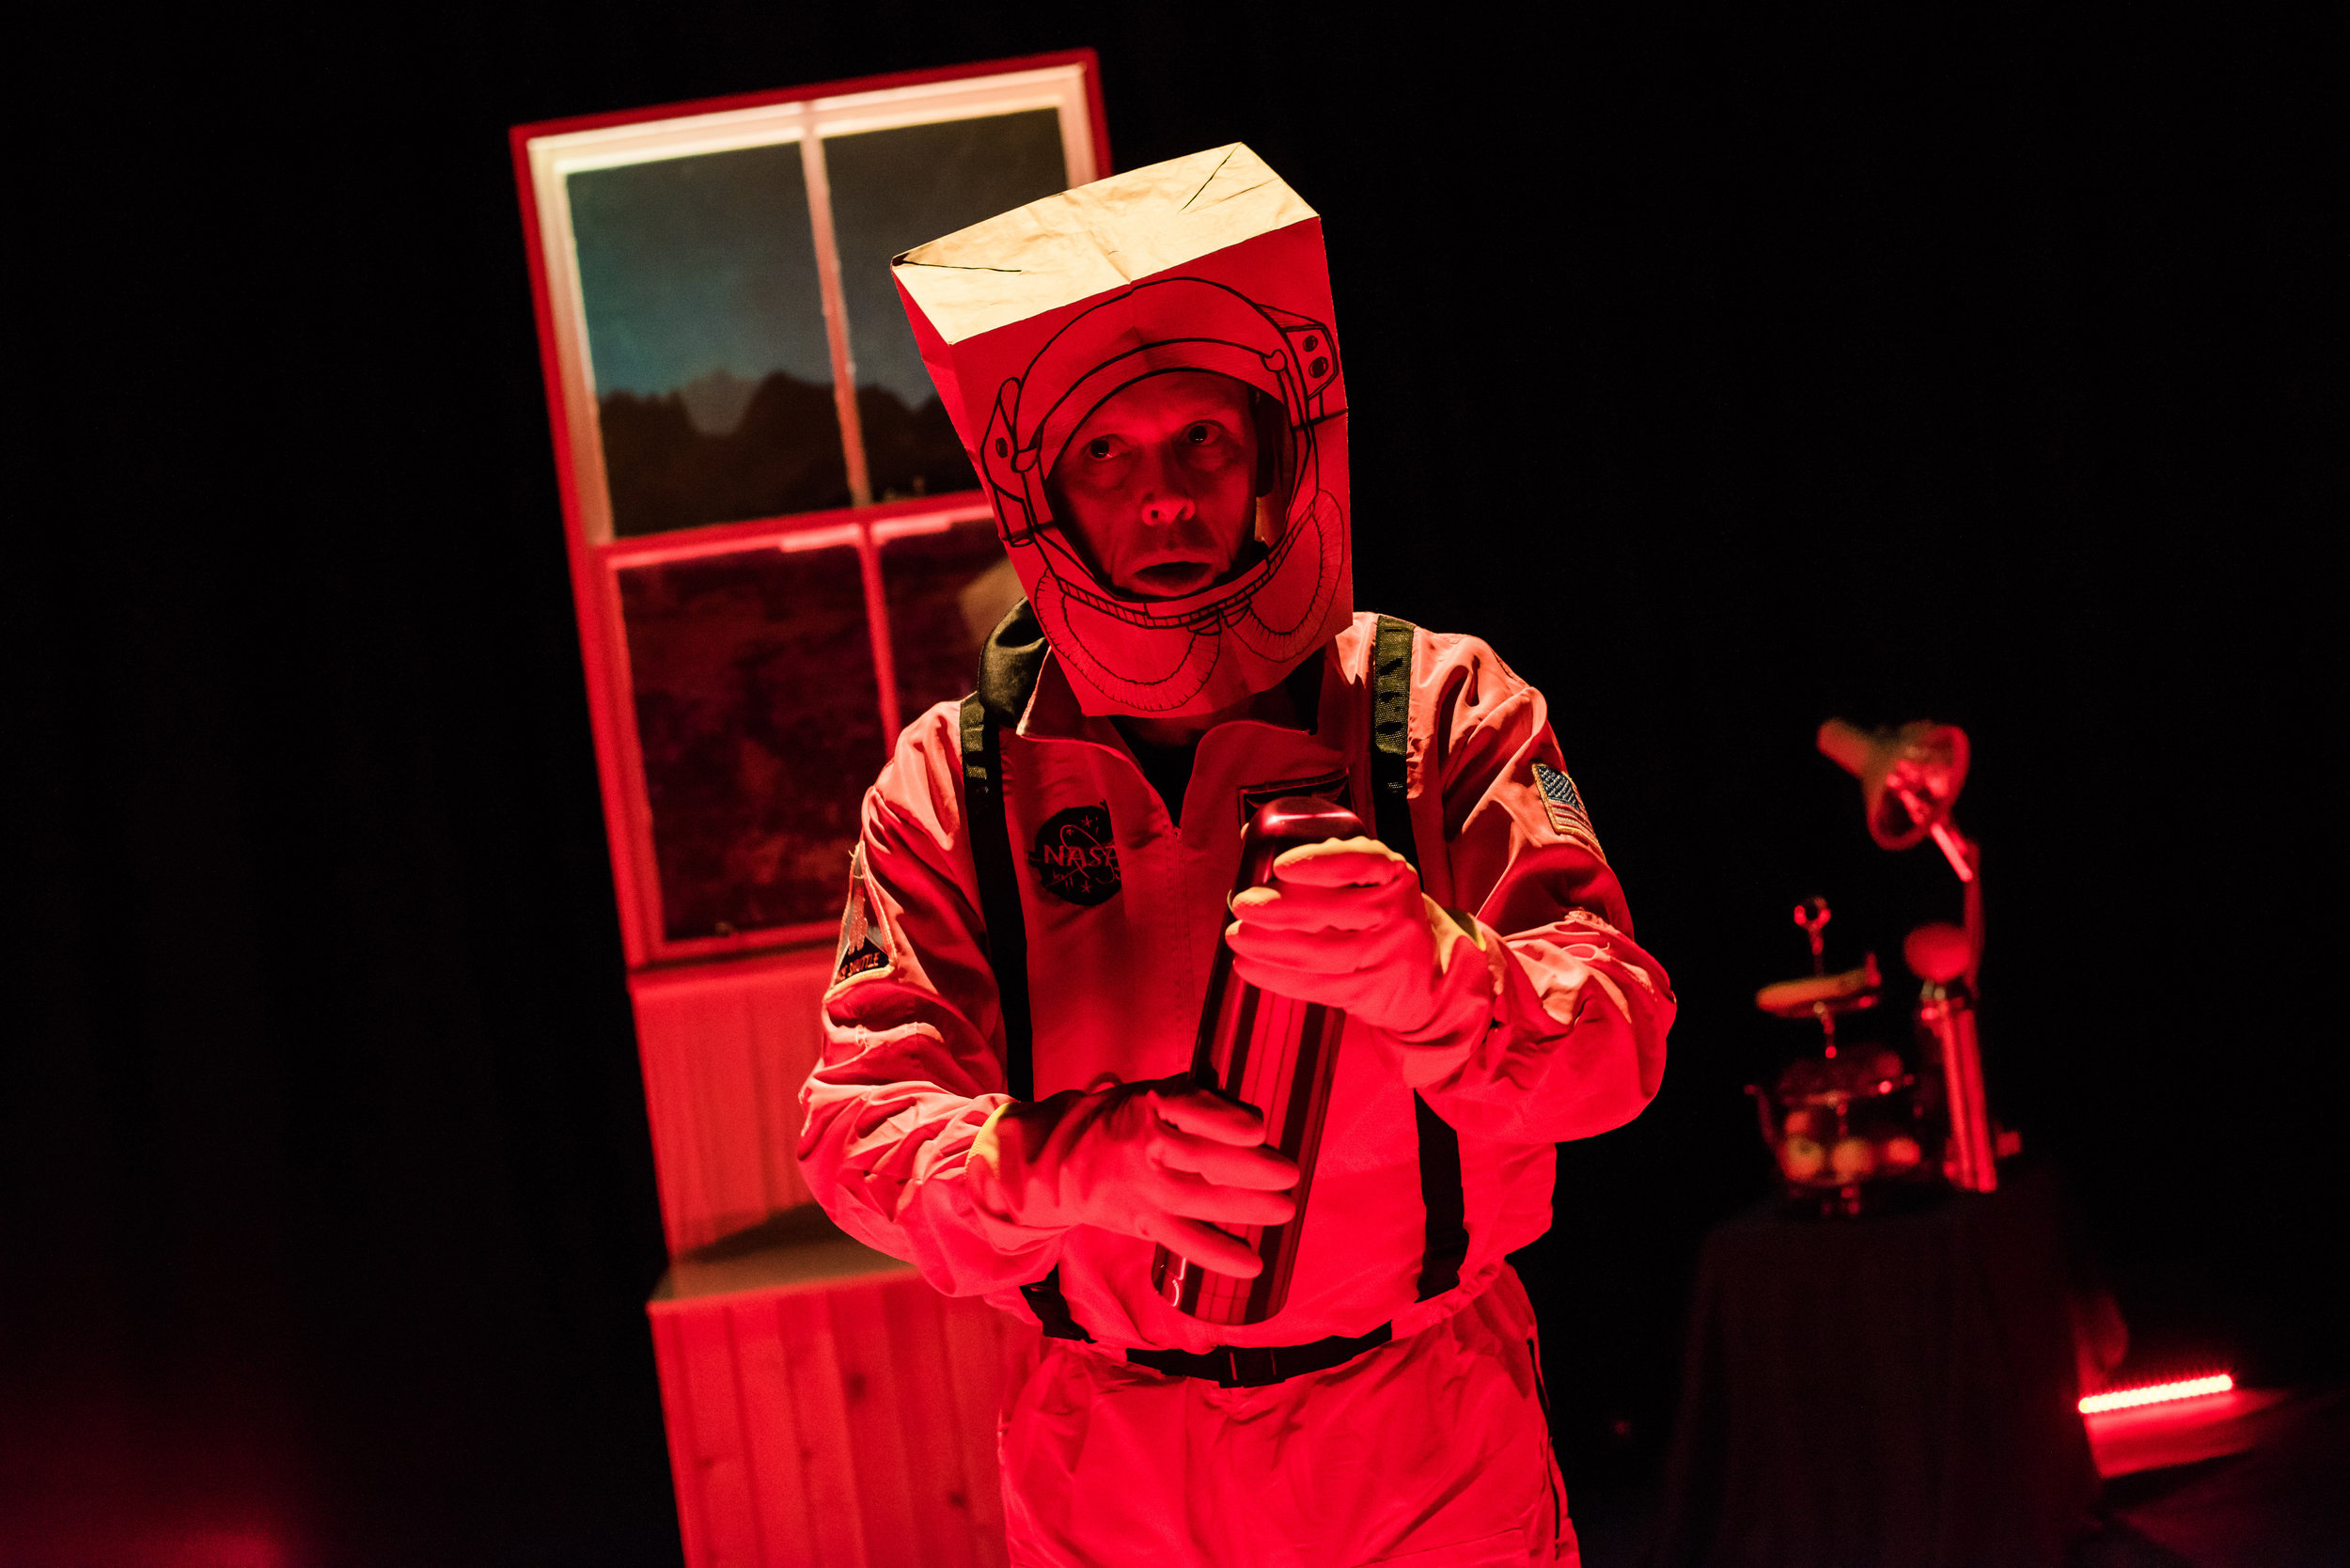 Space Ape 6 by Andy Cannon photo credit Mihaela Bodlovic.jpg